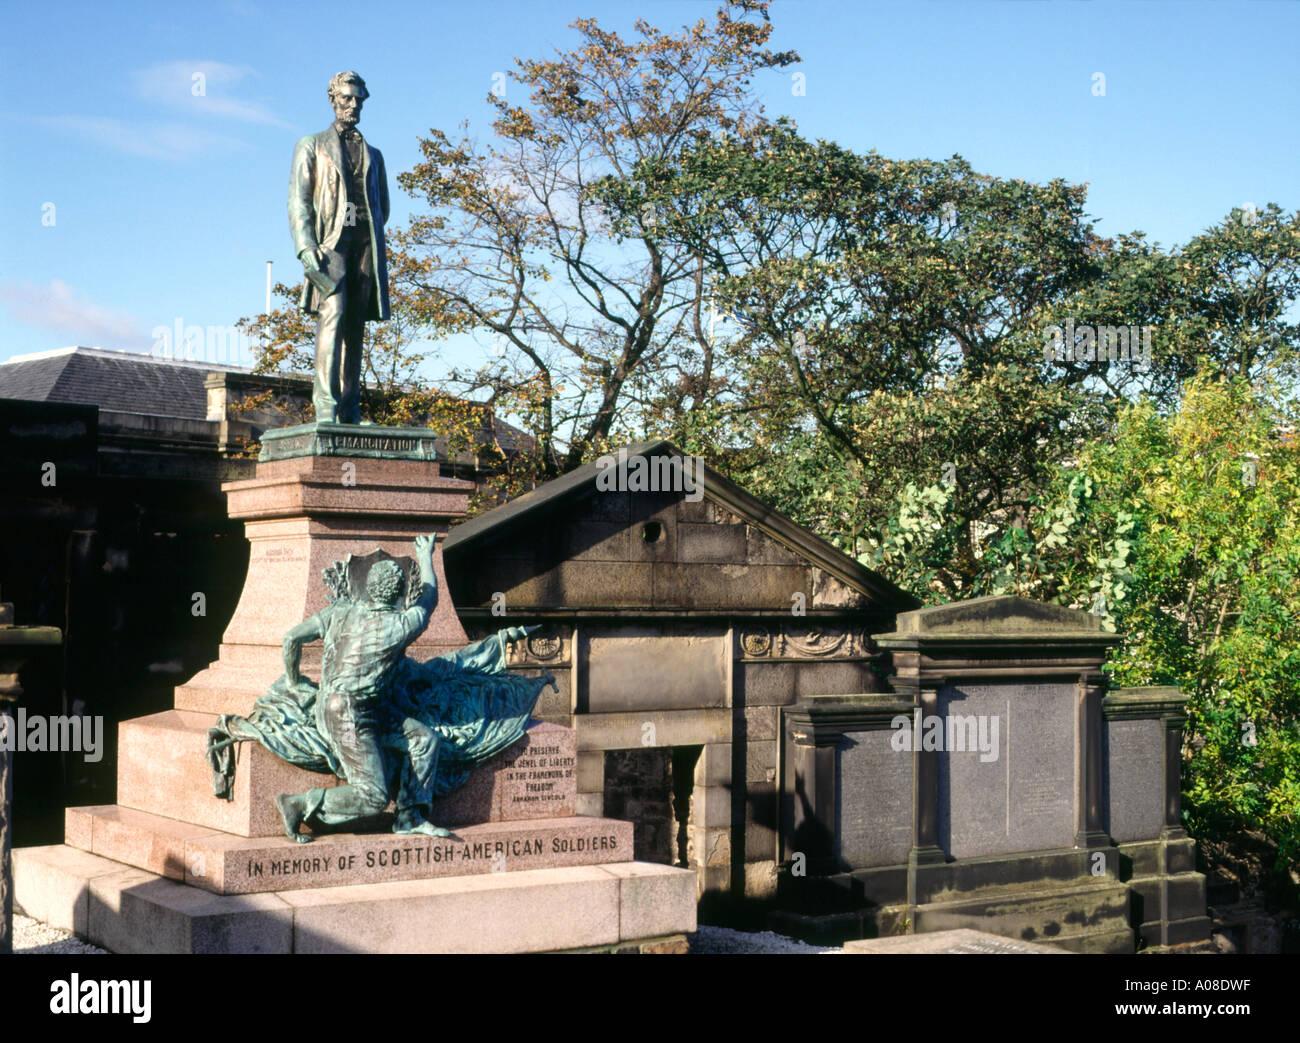 dh Scottish American monument CALTON CEMETERY EDINBURGH War soldiers memorial scotland graveyard old burial ground Stock Photo